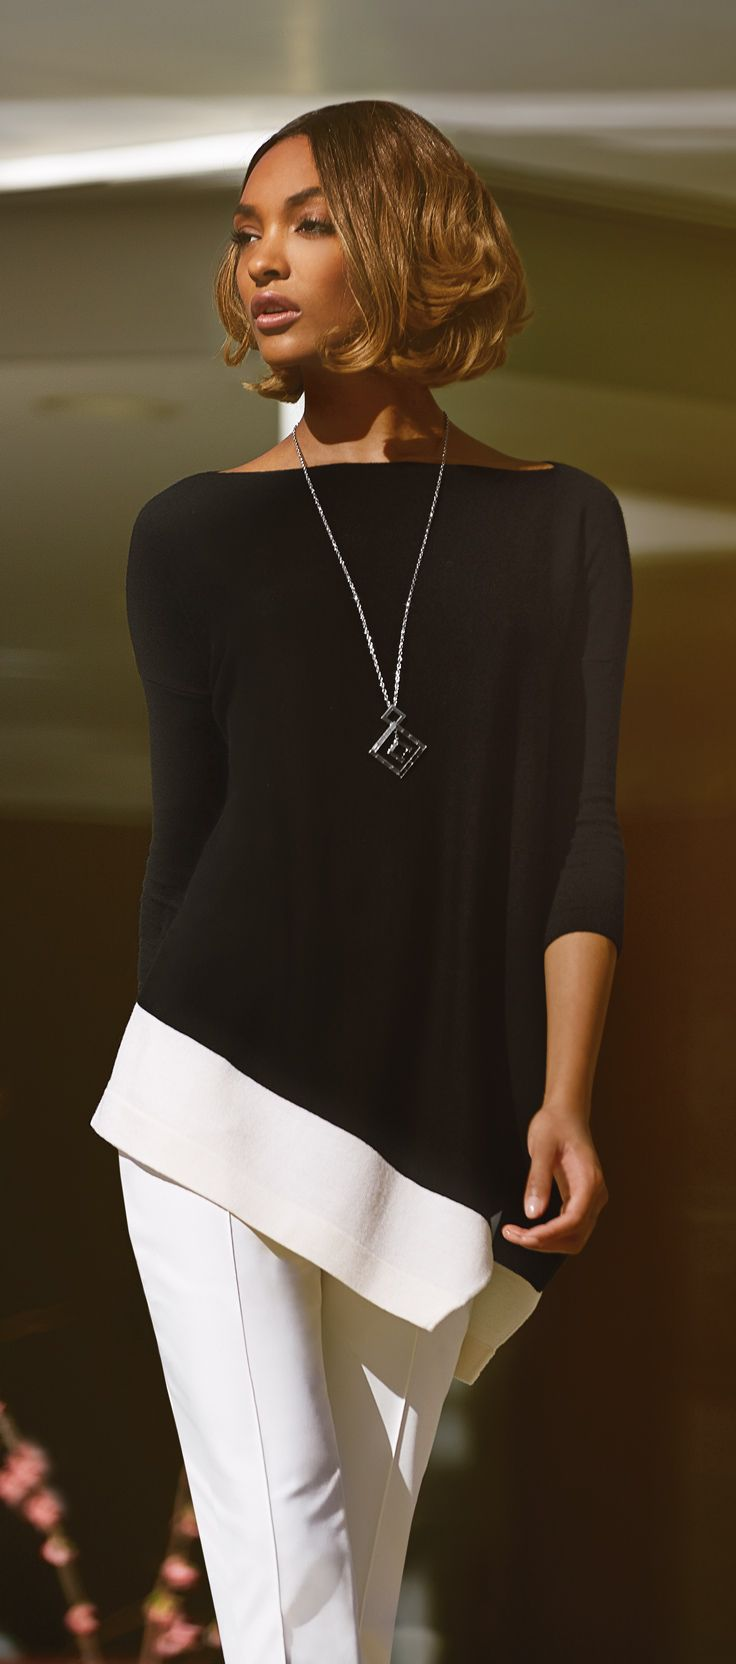 Jourdan Dunn in #StJohnKnits asymmetrical hemline sweater from the PreFall 2015 collection. | sjk.com